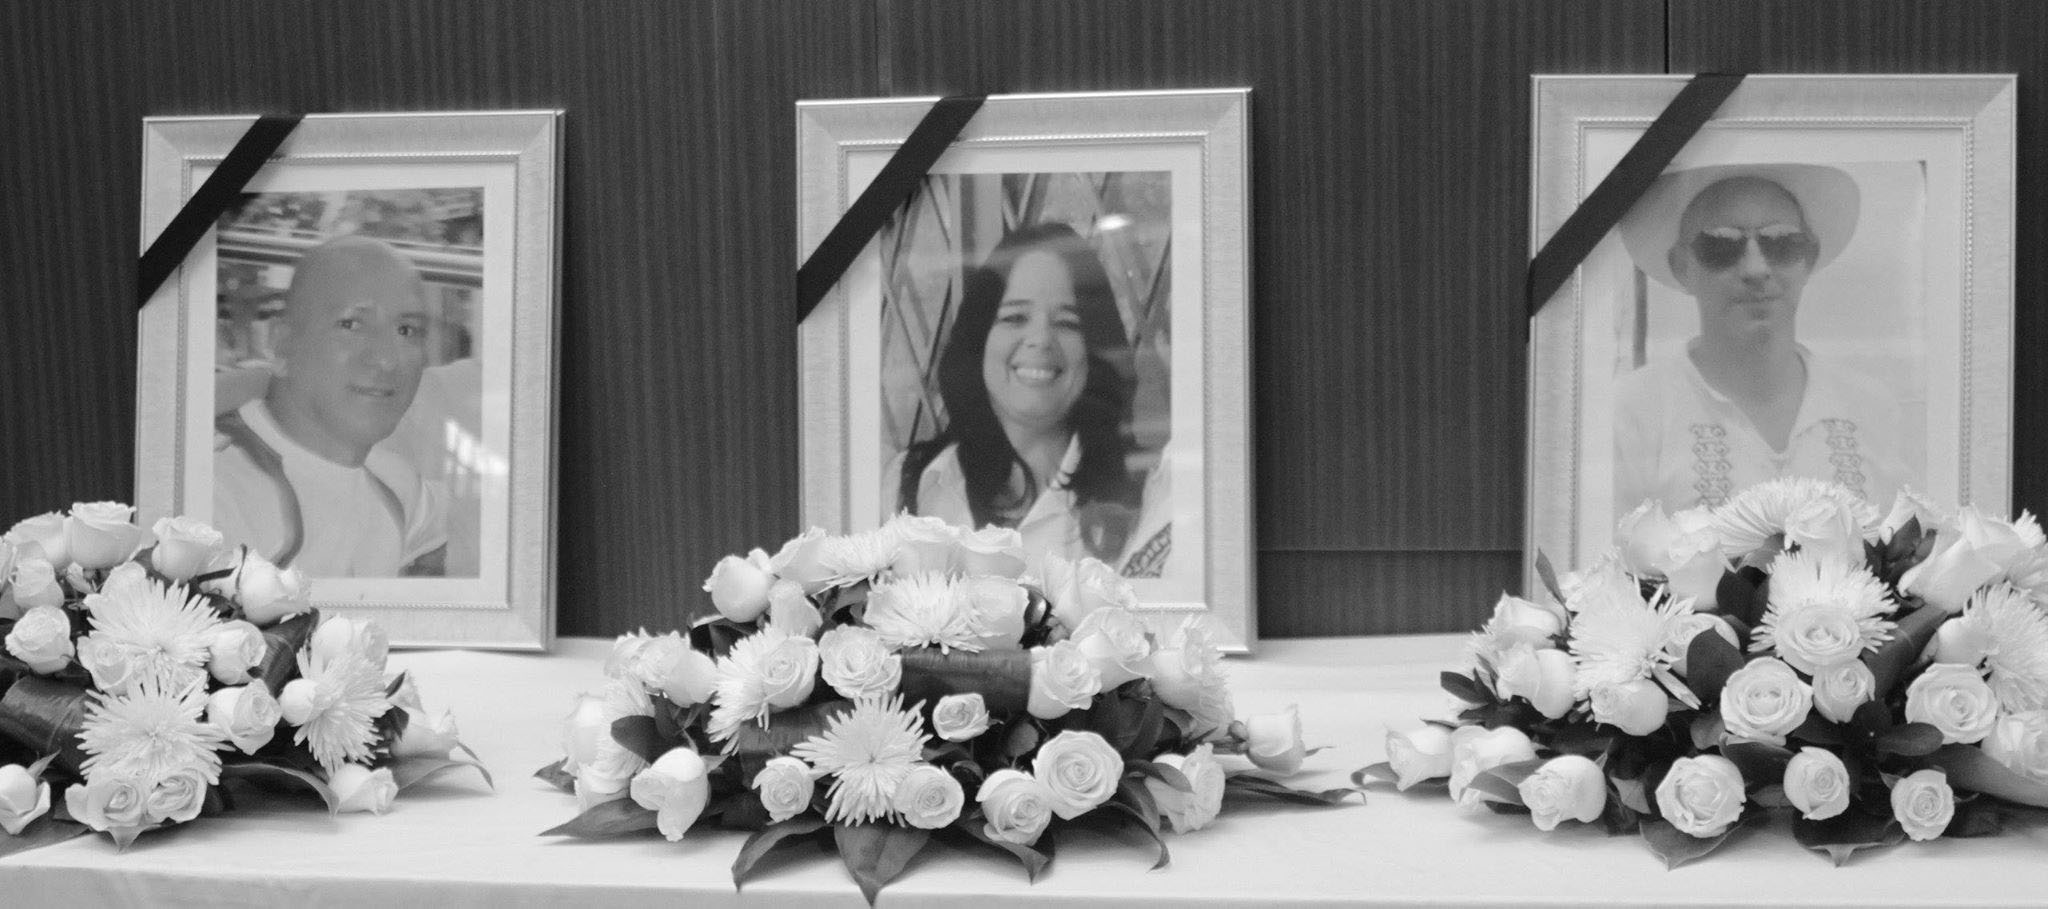 Honores en Ecuador a médicos cubanos fallecidos en terremoto